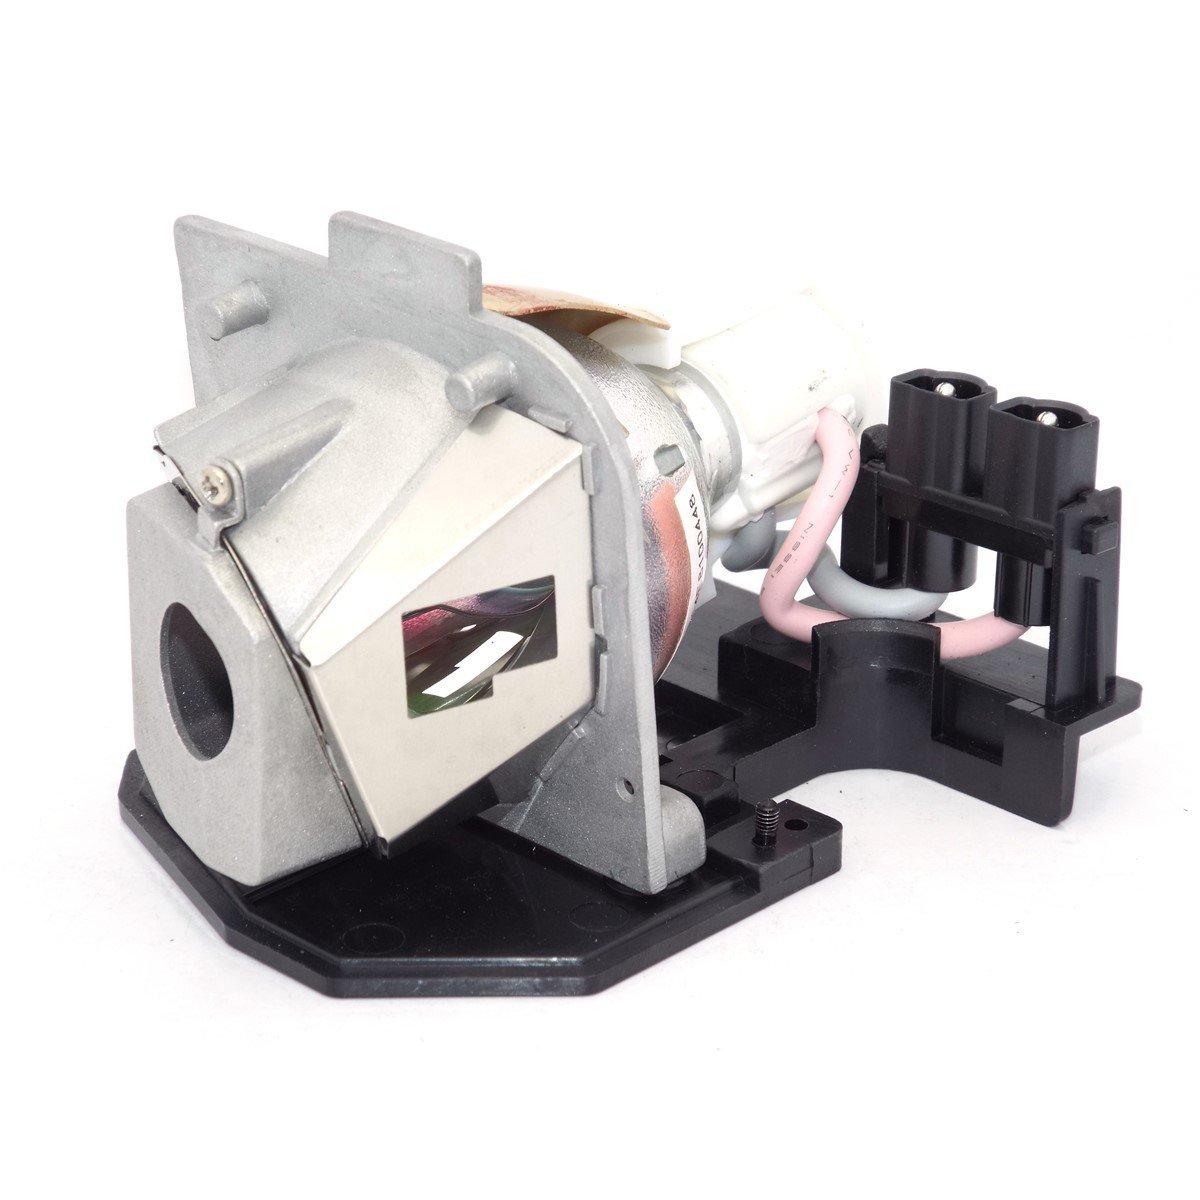 SP。89 F01gc01 Optoma hd65プロジェクターランプ B00C9DKOHK